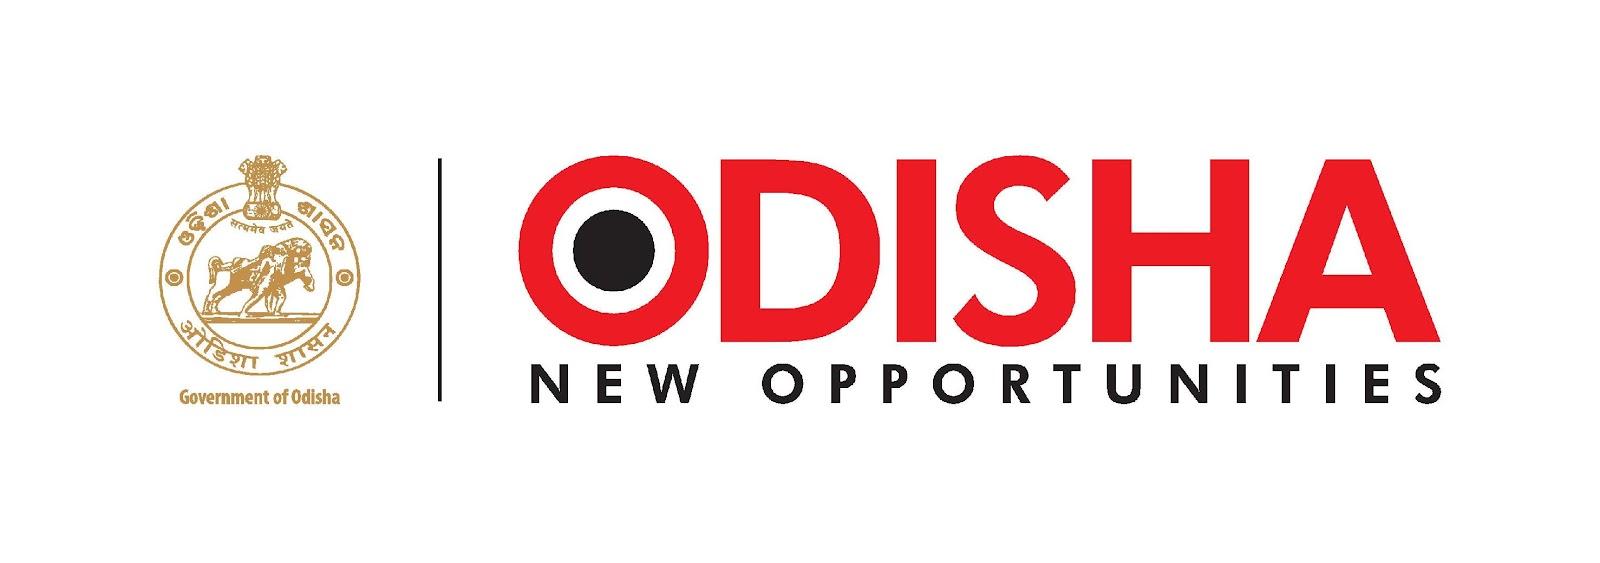 co-branding logo (1)-page-001.jpg